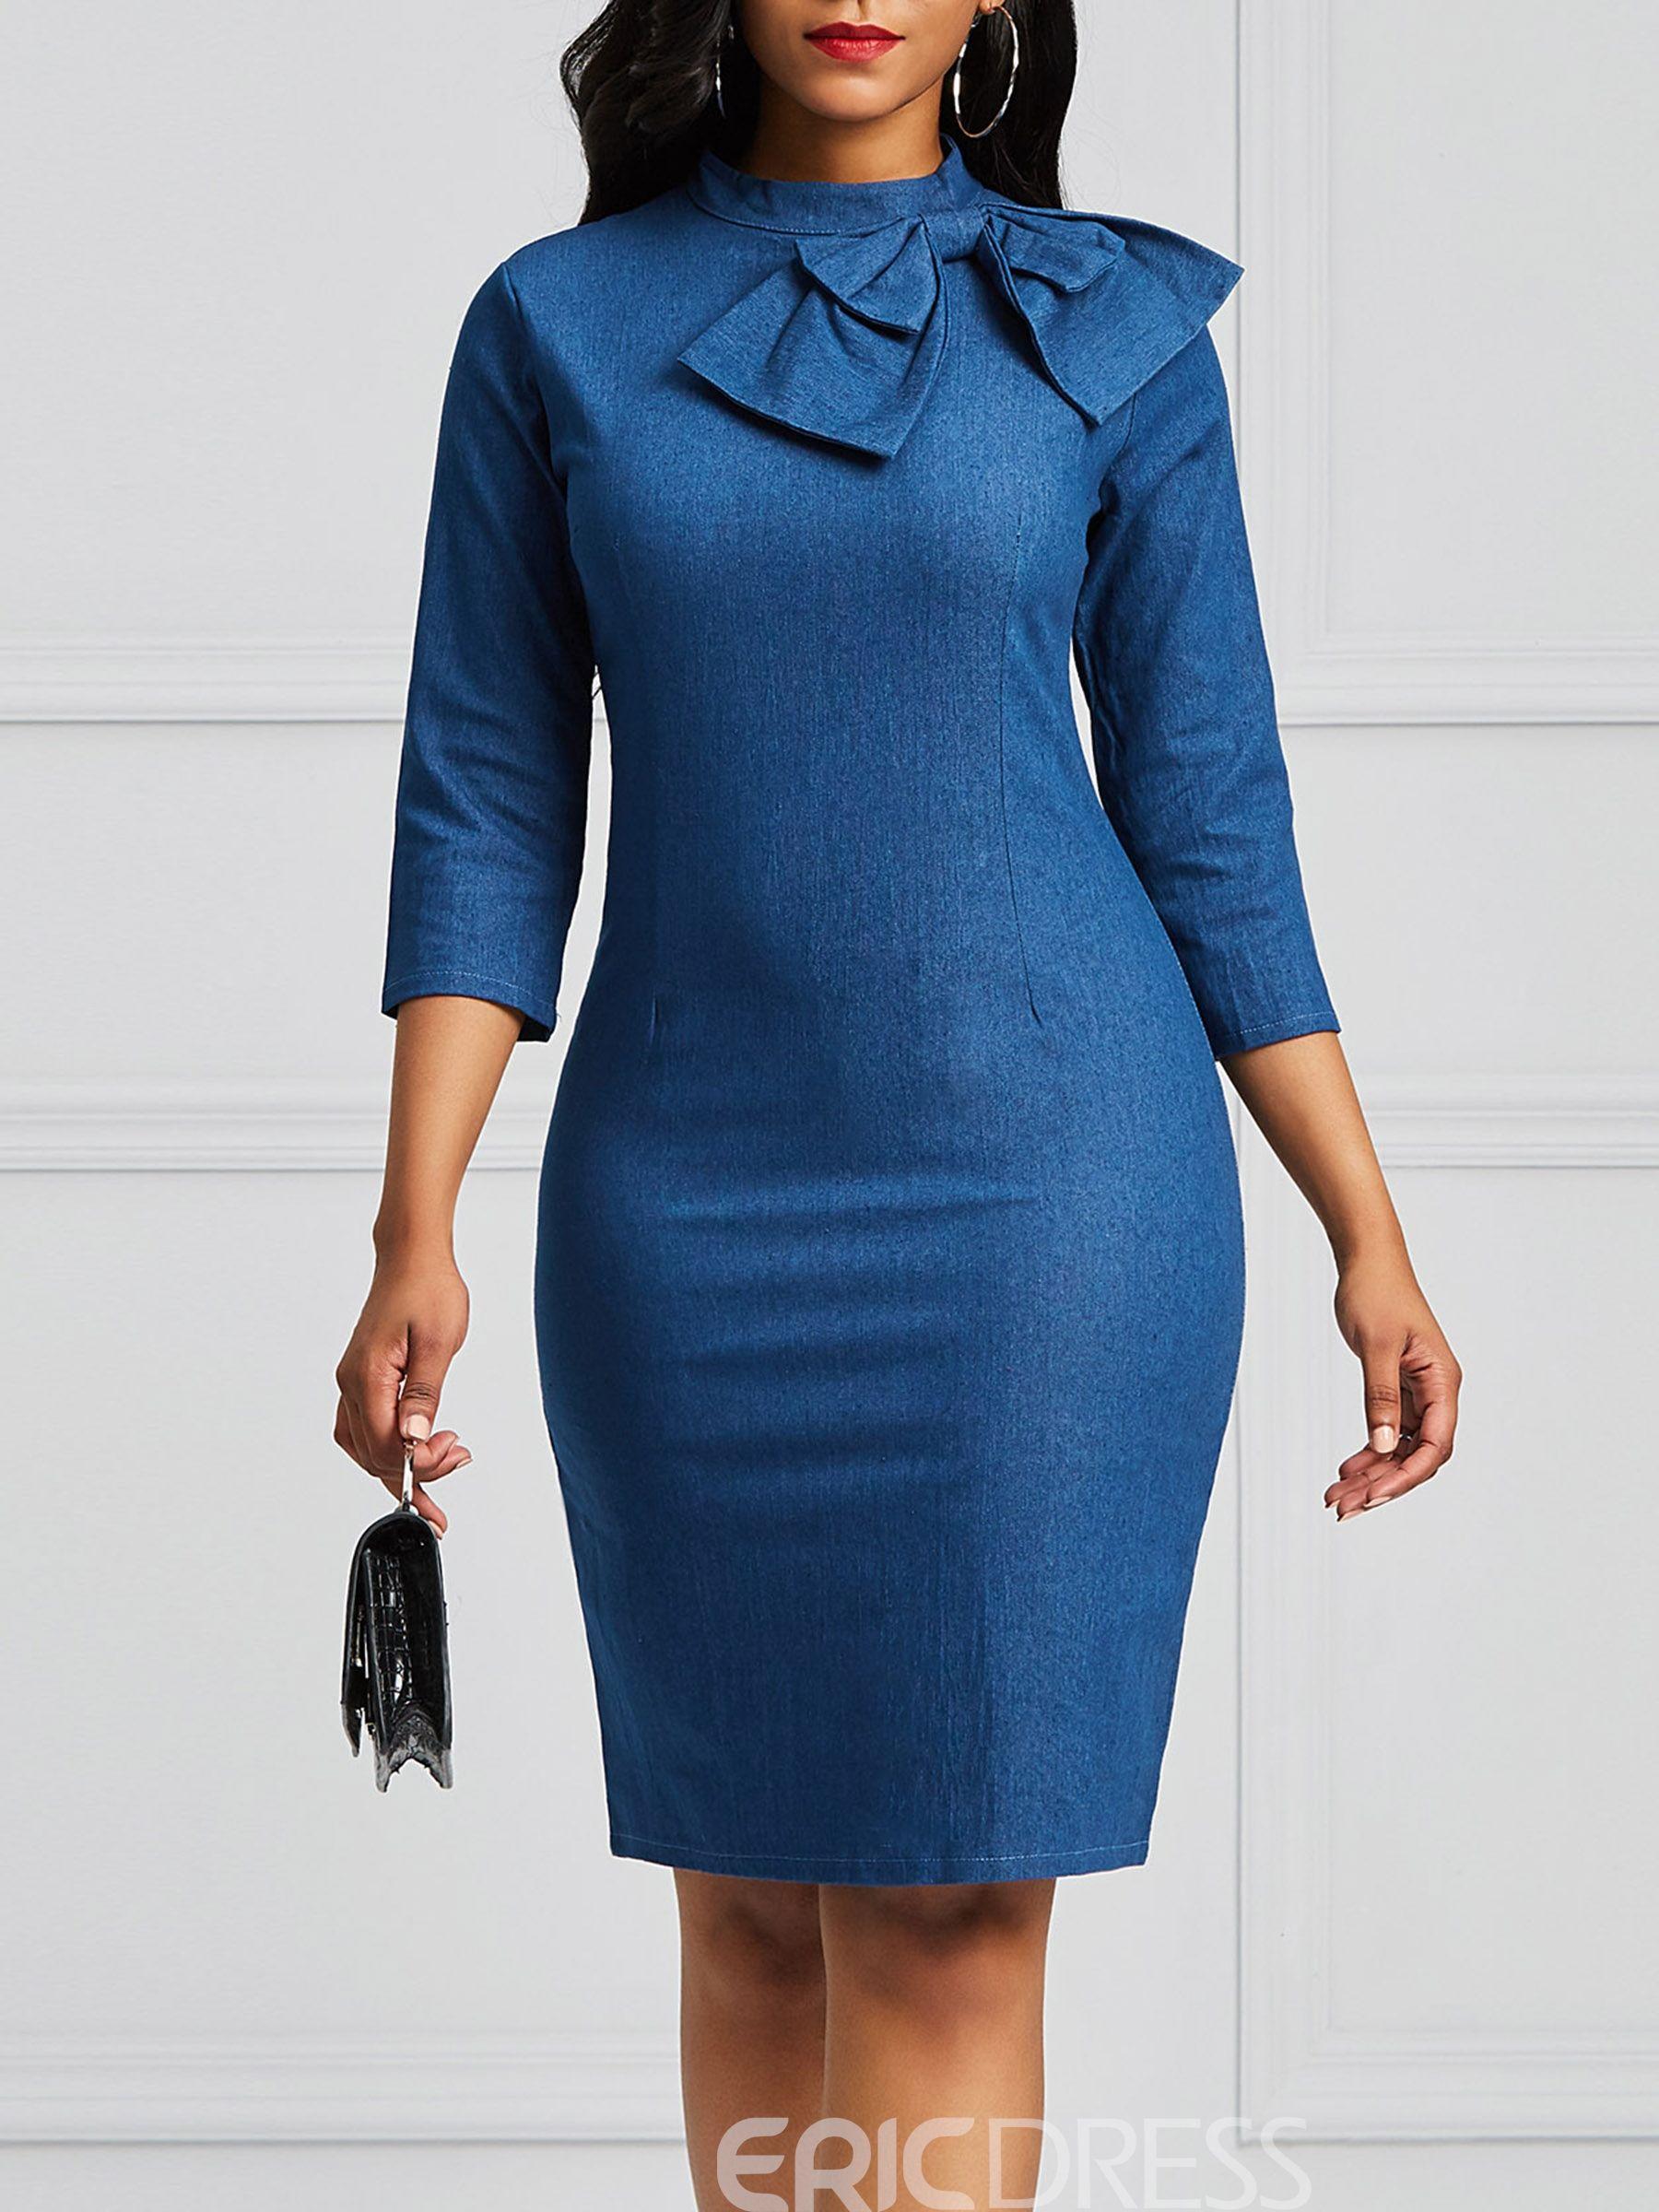 Ericdress Bowknot Women S Denim Bodycon Dress Denim Bodycon Dress Bodycon Dress Women Bodycon Dress [ 2400 x 1800 Pixel ]